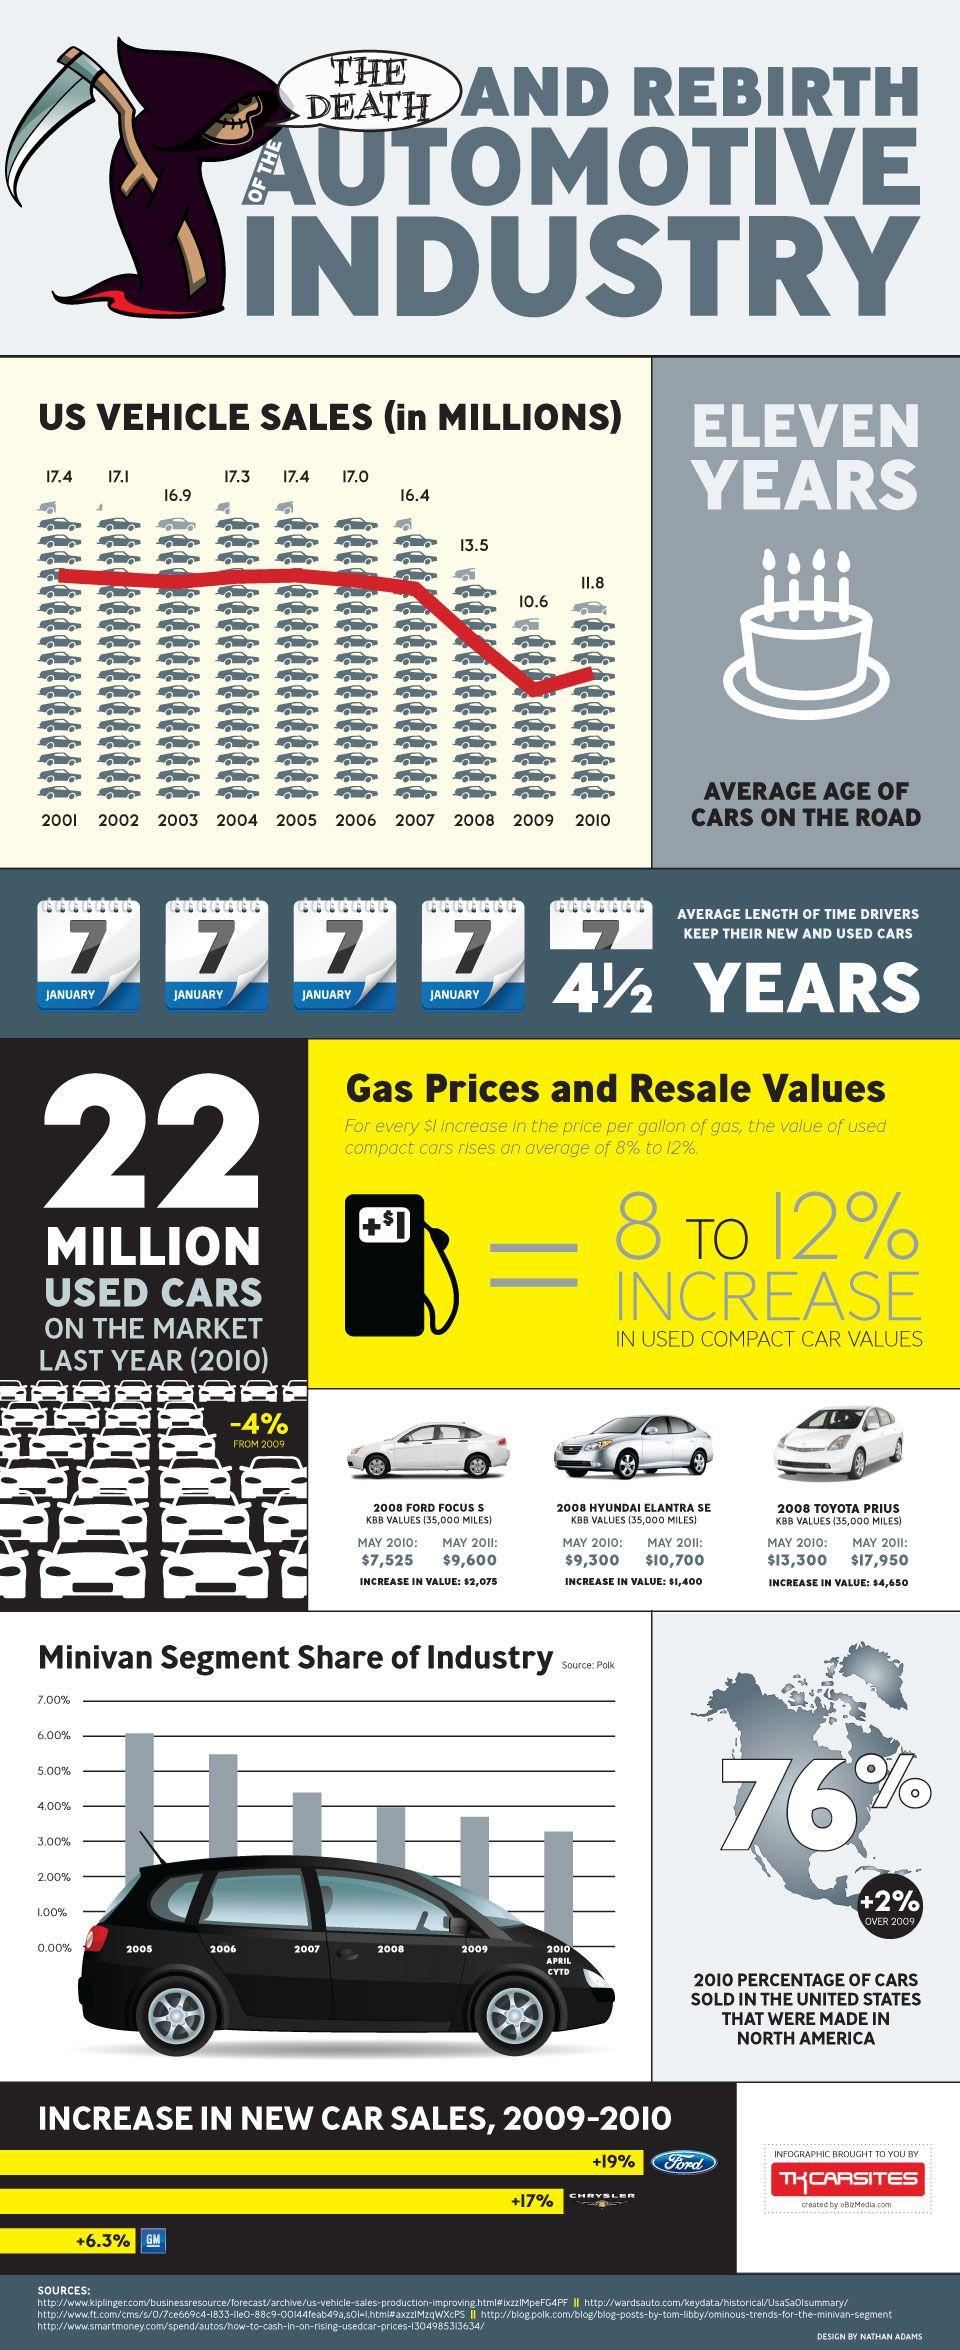 Automotive News mars 2011 by technomag-ch - issuu